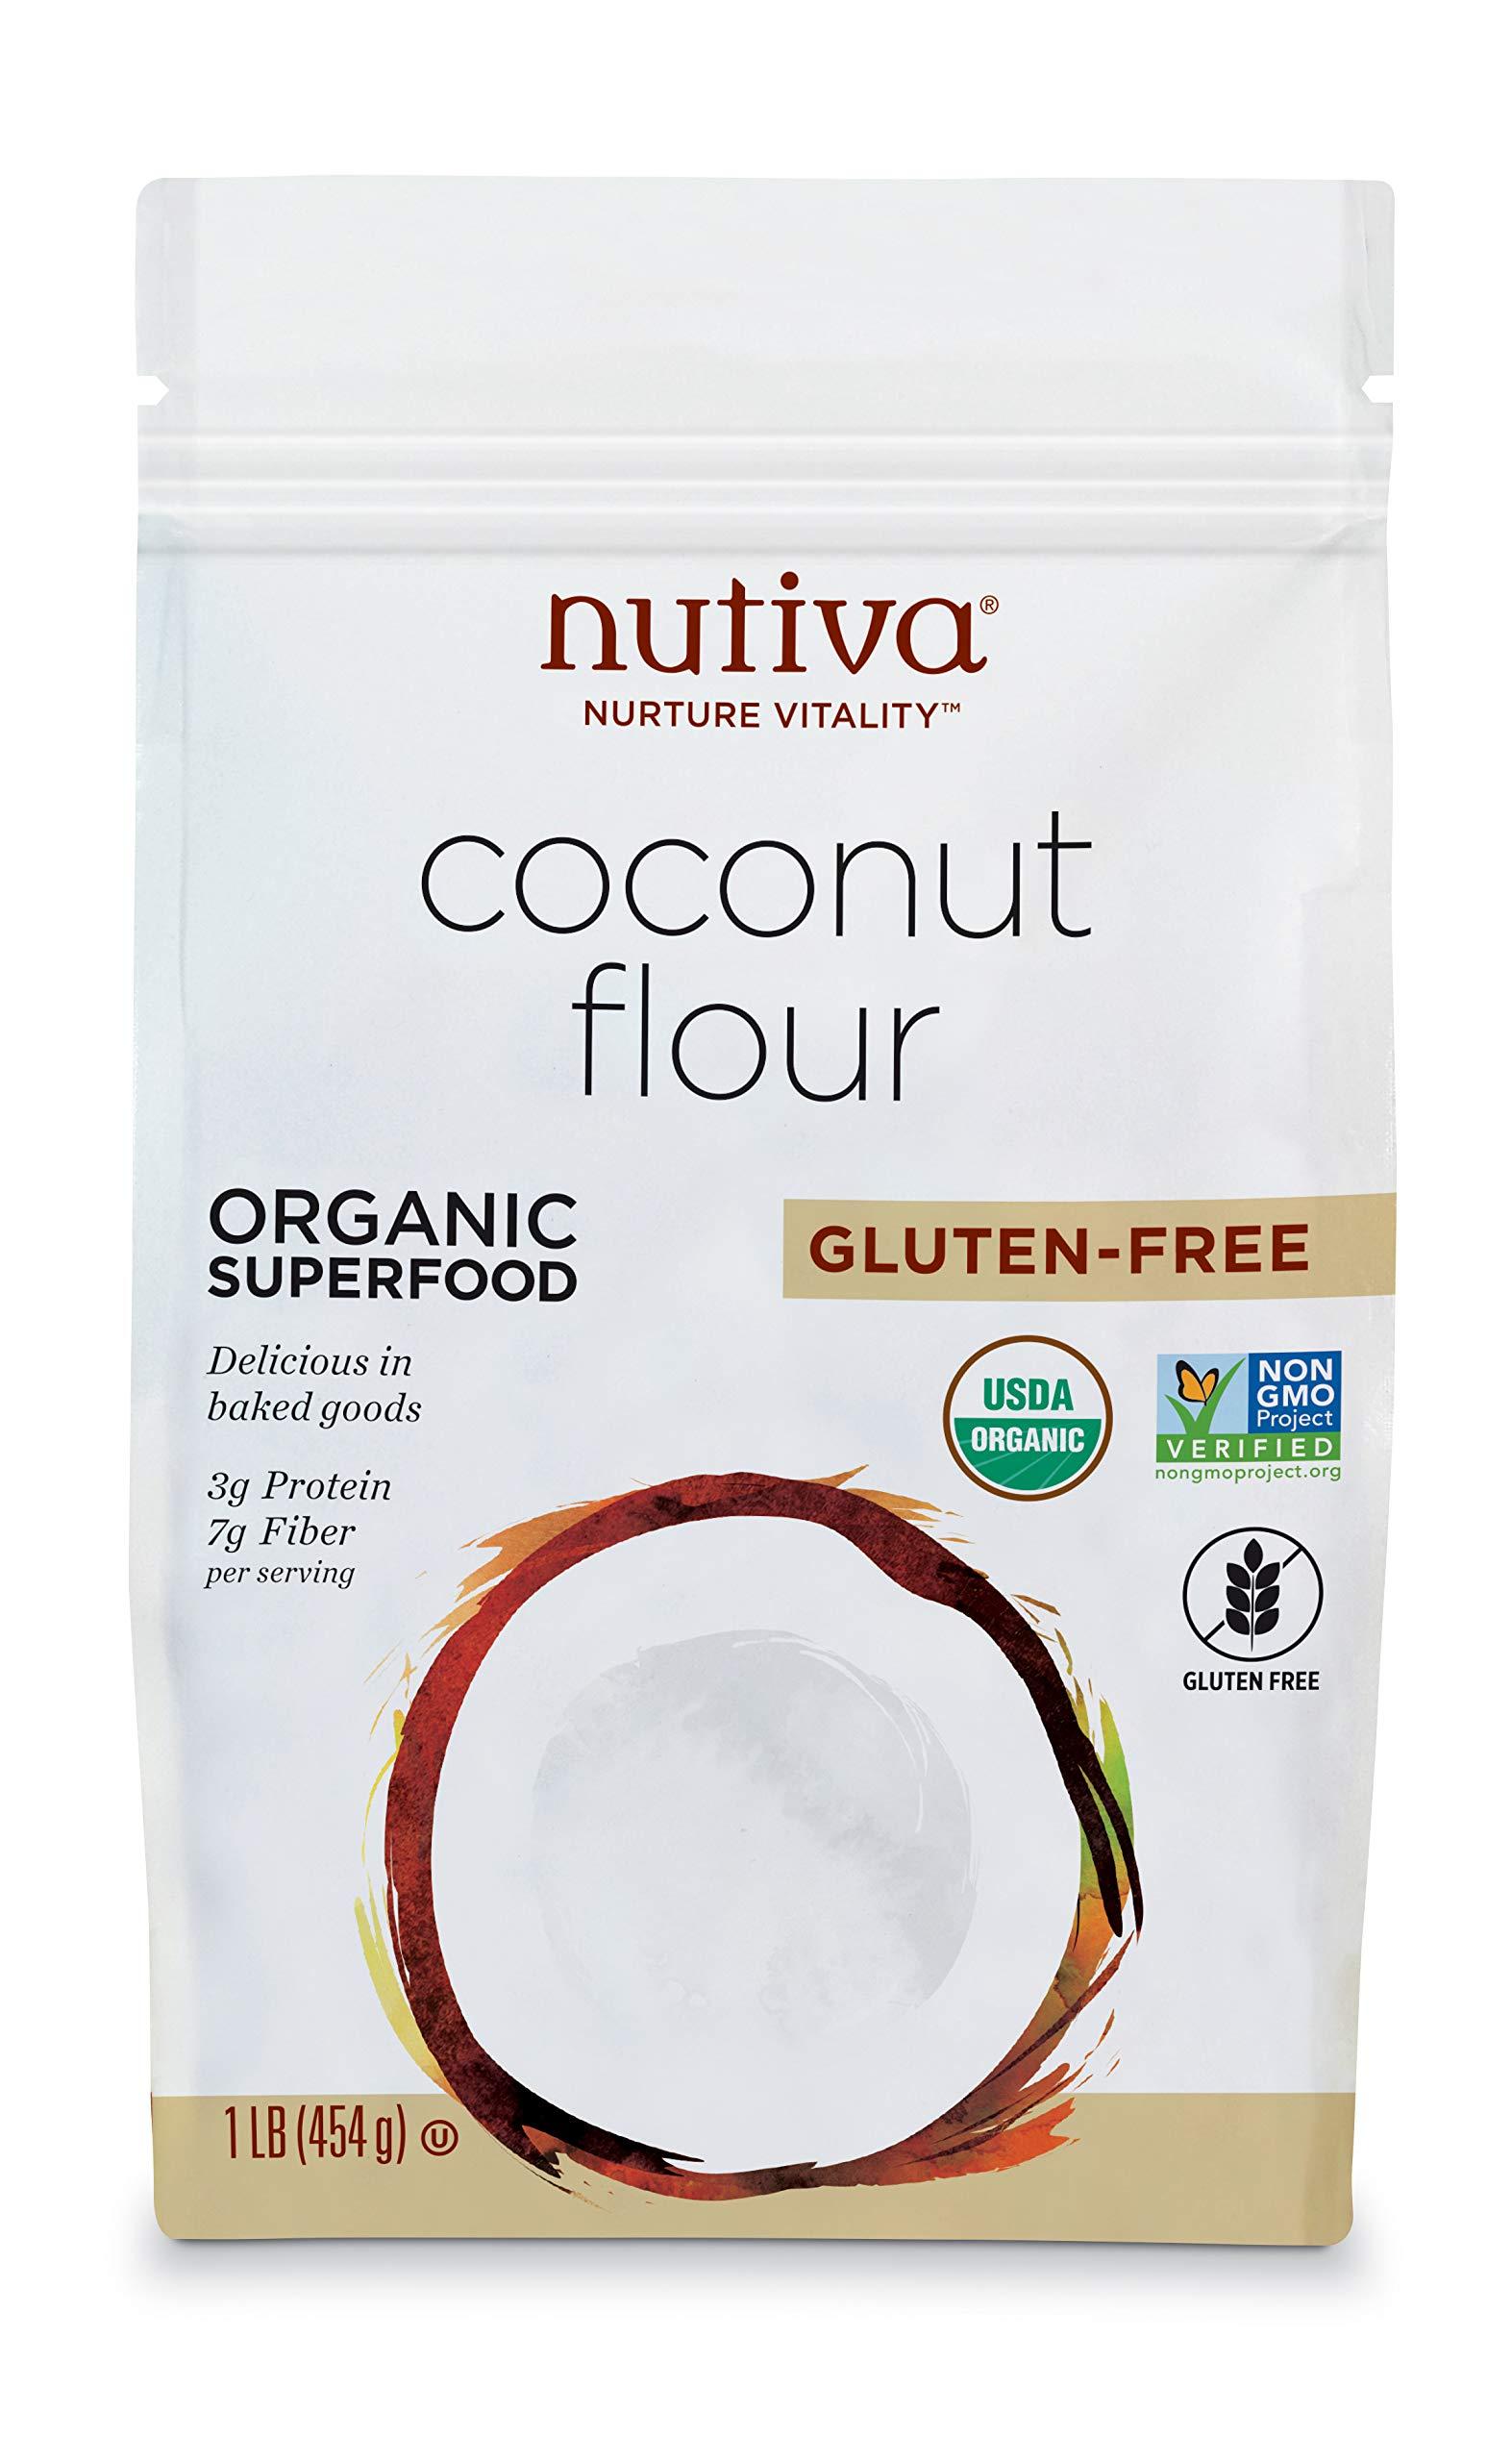 Nutiva USDA Certified Organic, non-GMO, Gluten-free Coconut Flour, 16-ounce (Pack of 6)